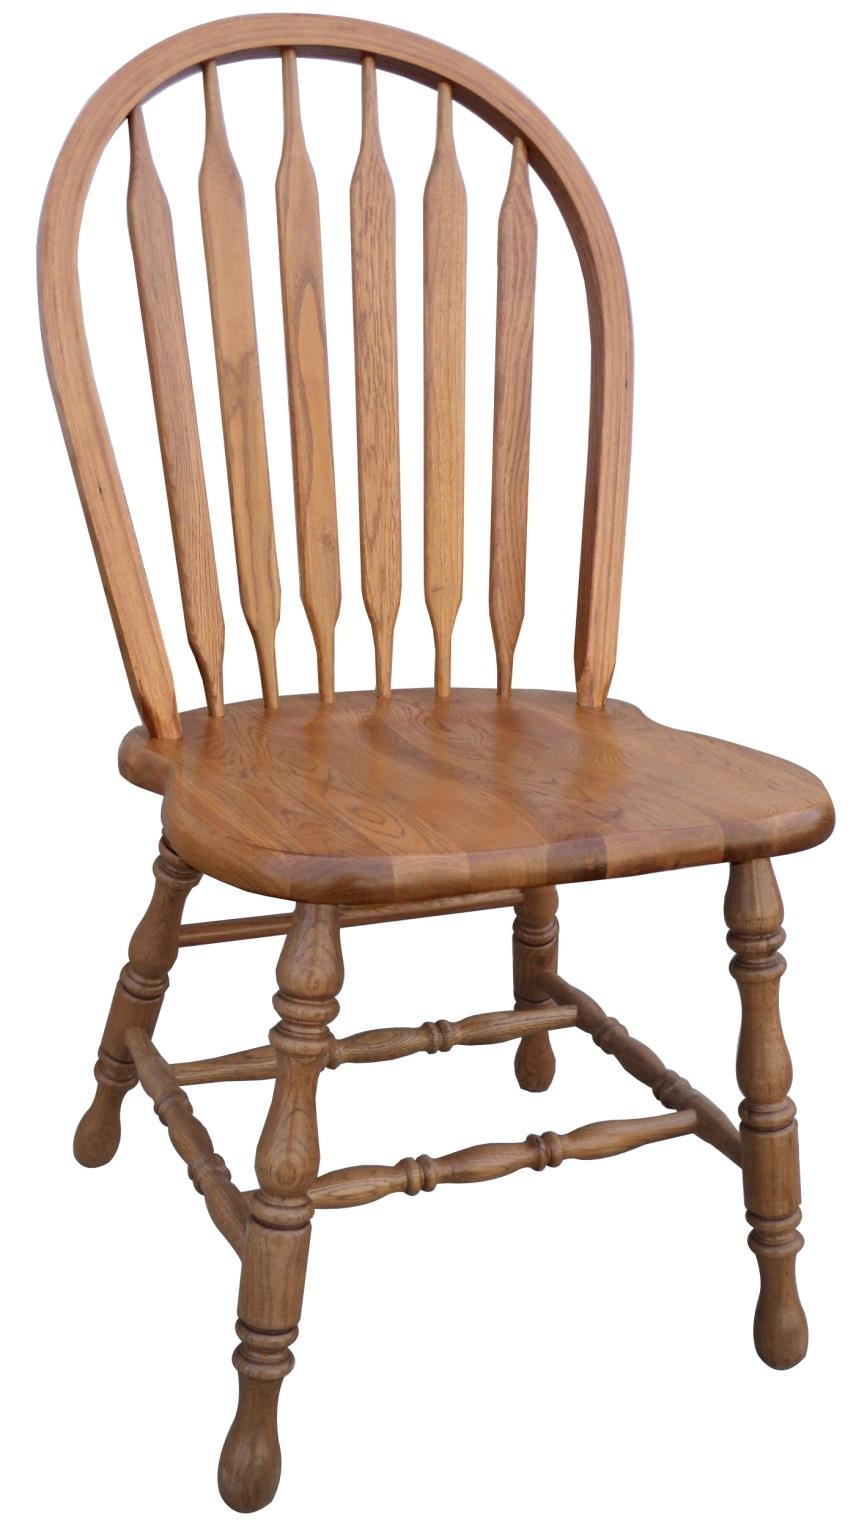 Weiss Furniture